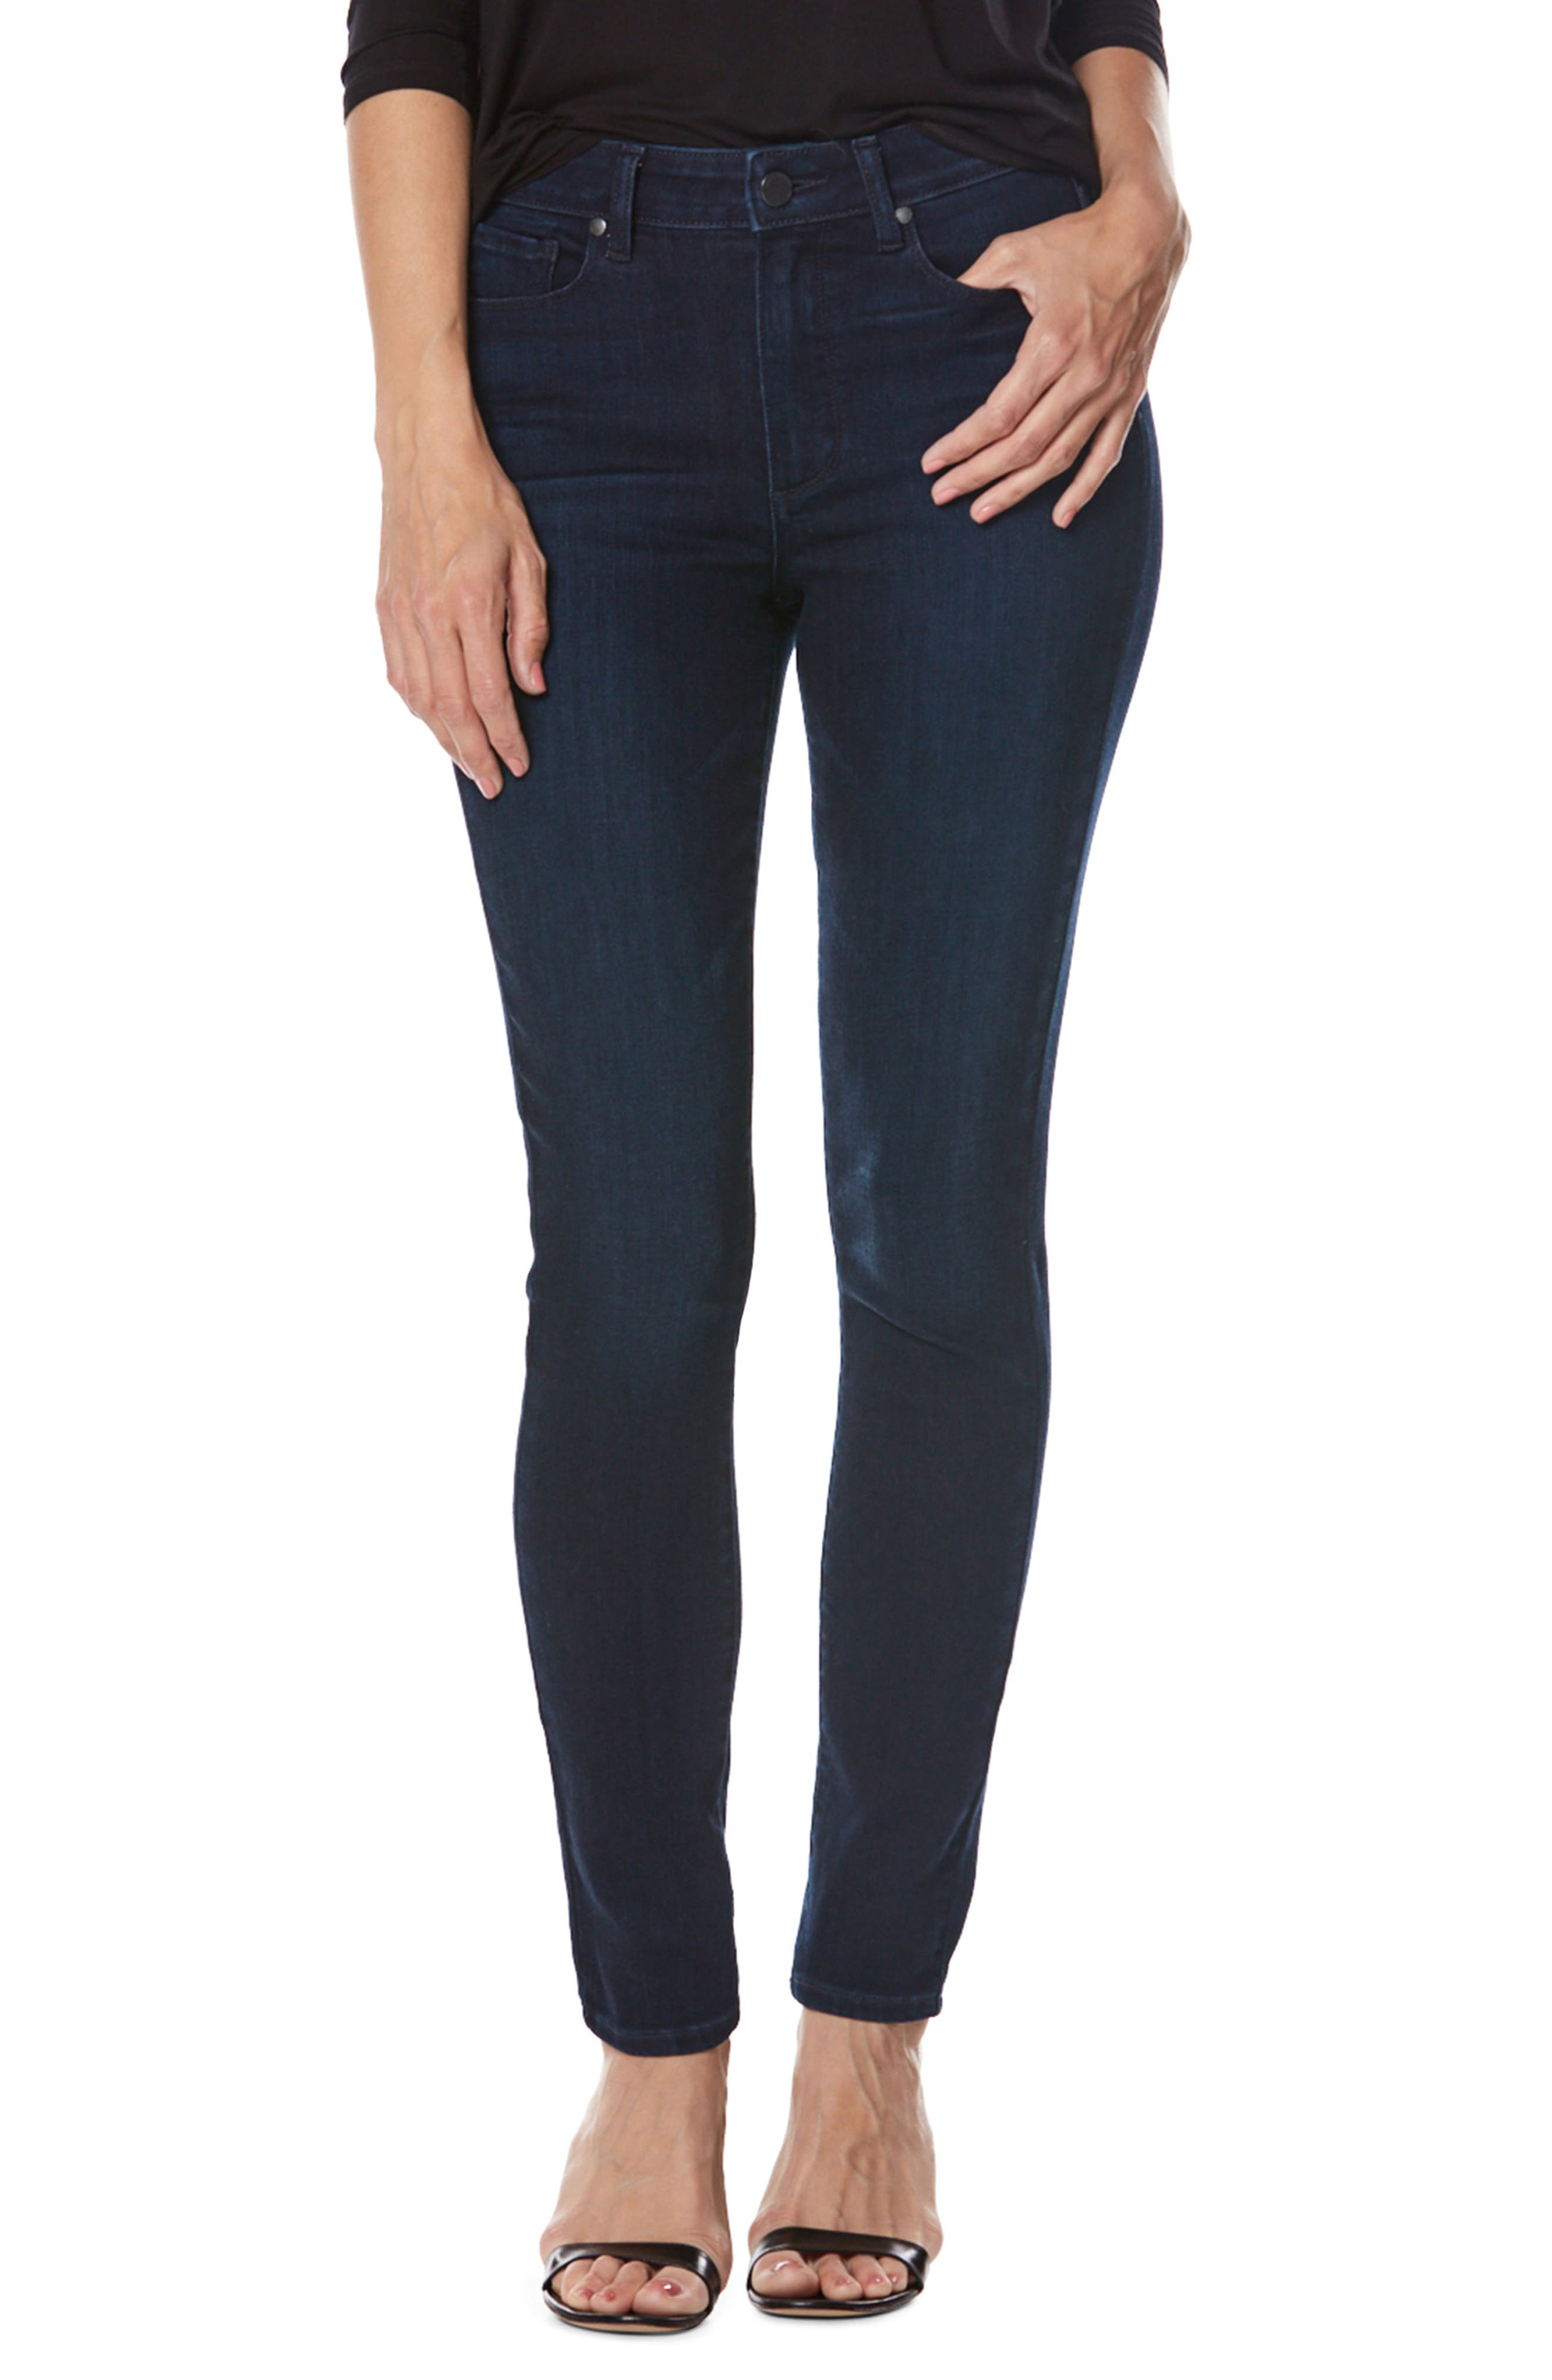 Transcend - Hoxton High Waist Ultra Skinny Jeans,                         Main,                         color,